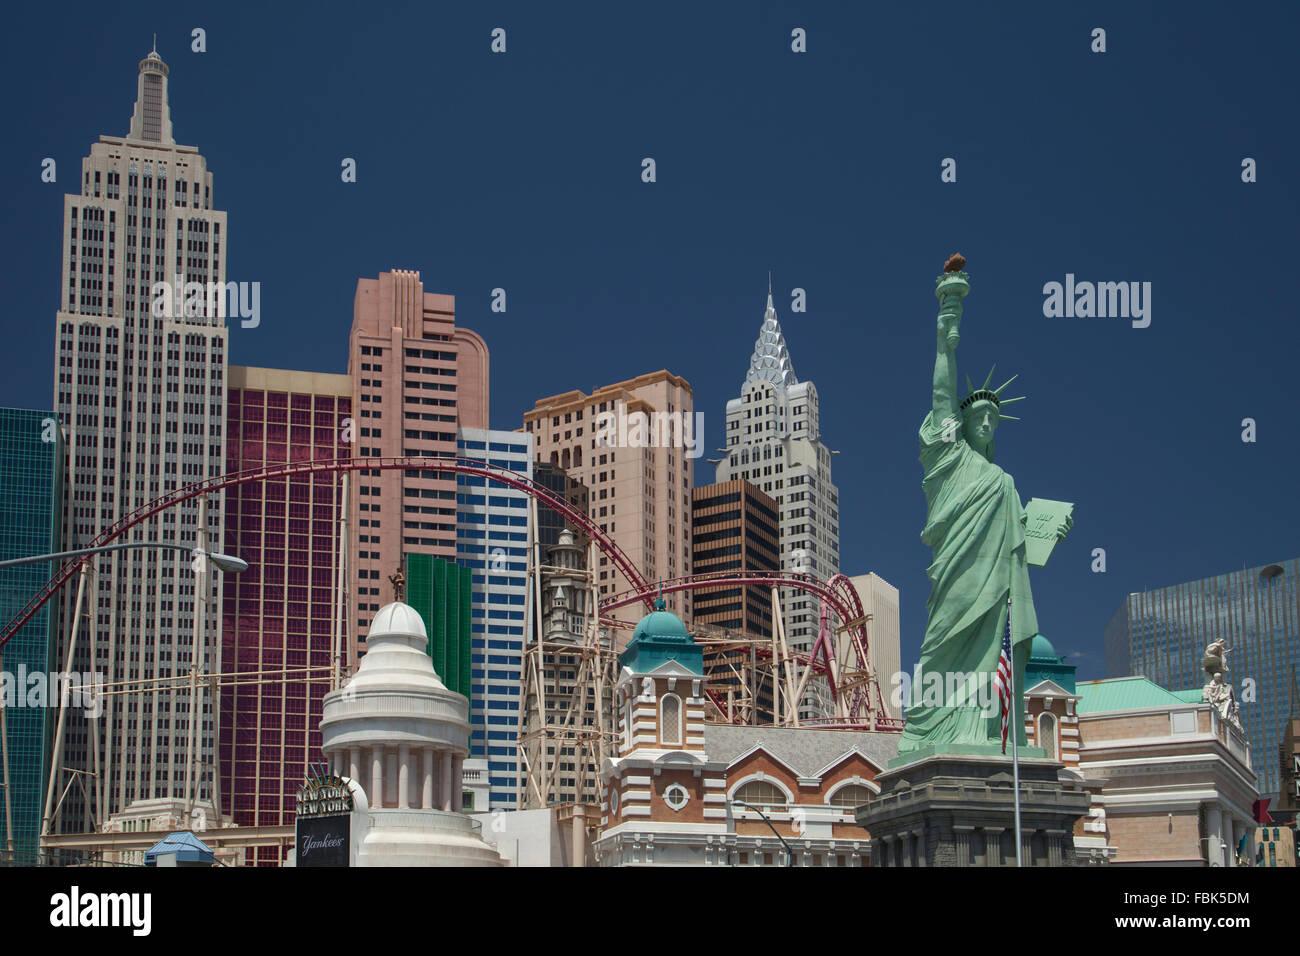 New York New York Casino - Las Vegas Photo Stock